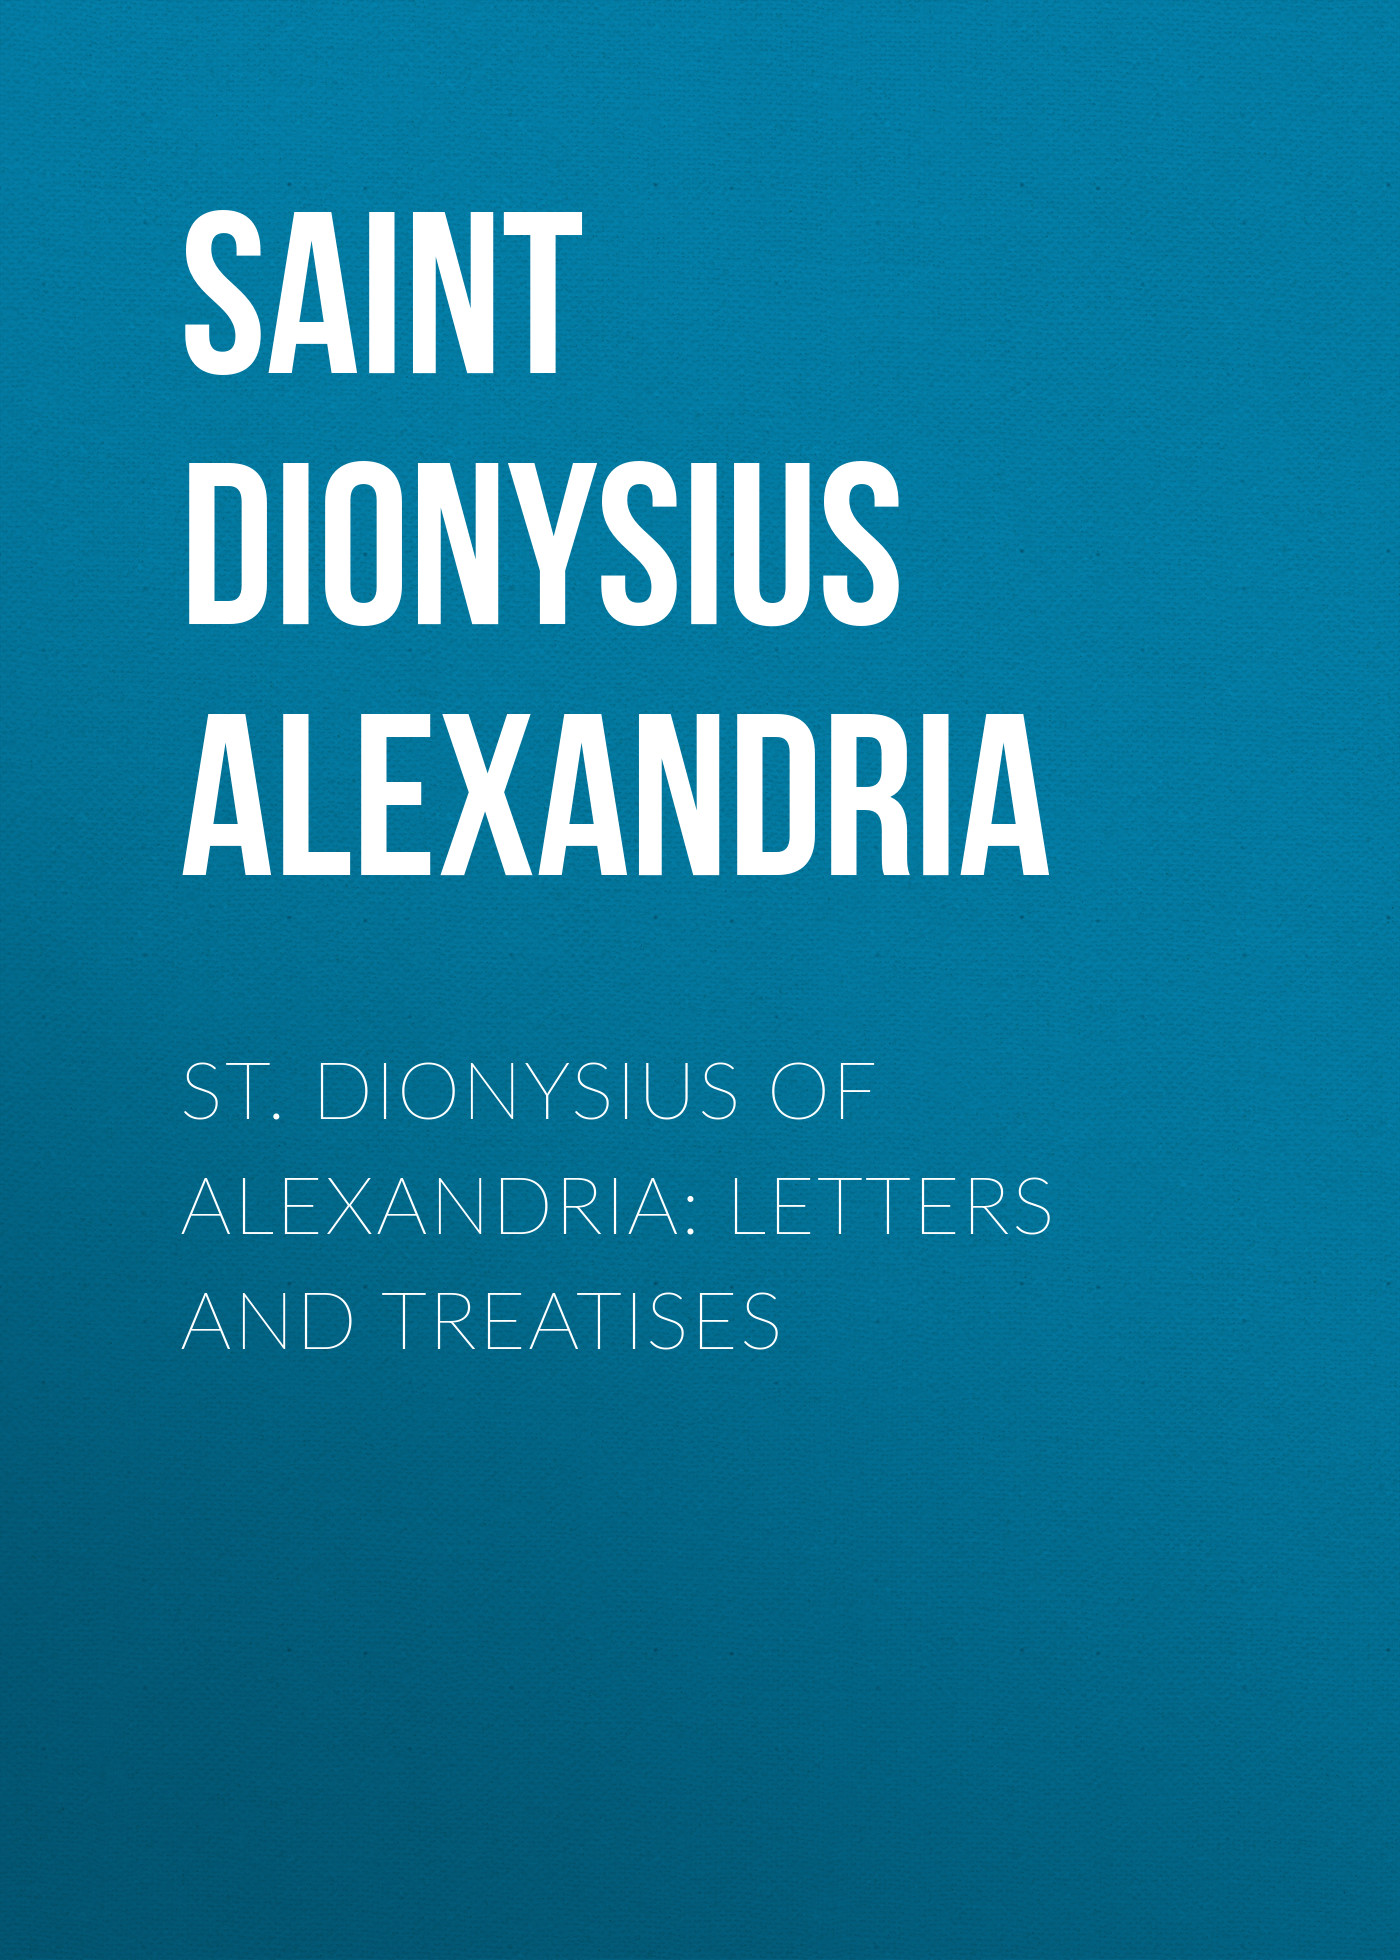 Saint Dionysius of Alexandria St. Dionysius of Alexandria: Letters and Treatises saint athanasius select treatises of st athanasius in controversy